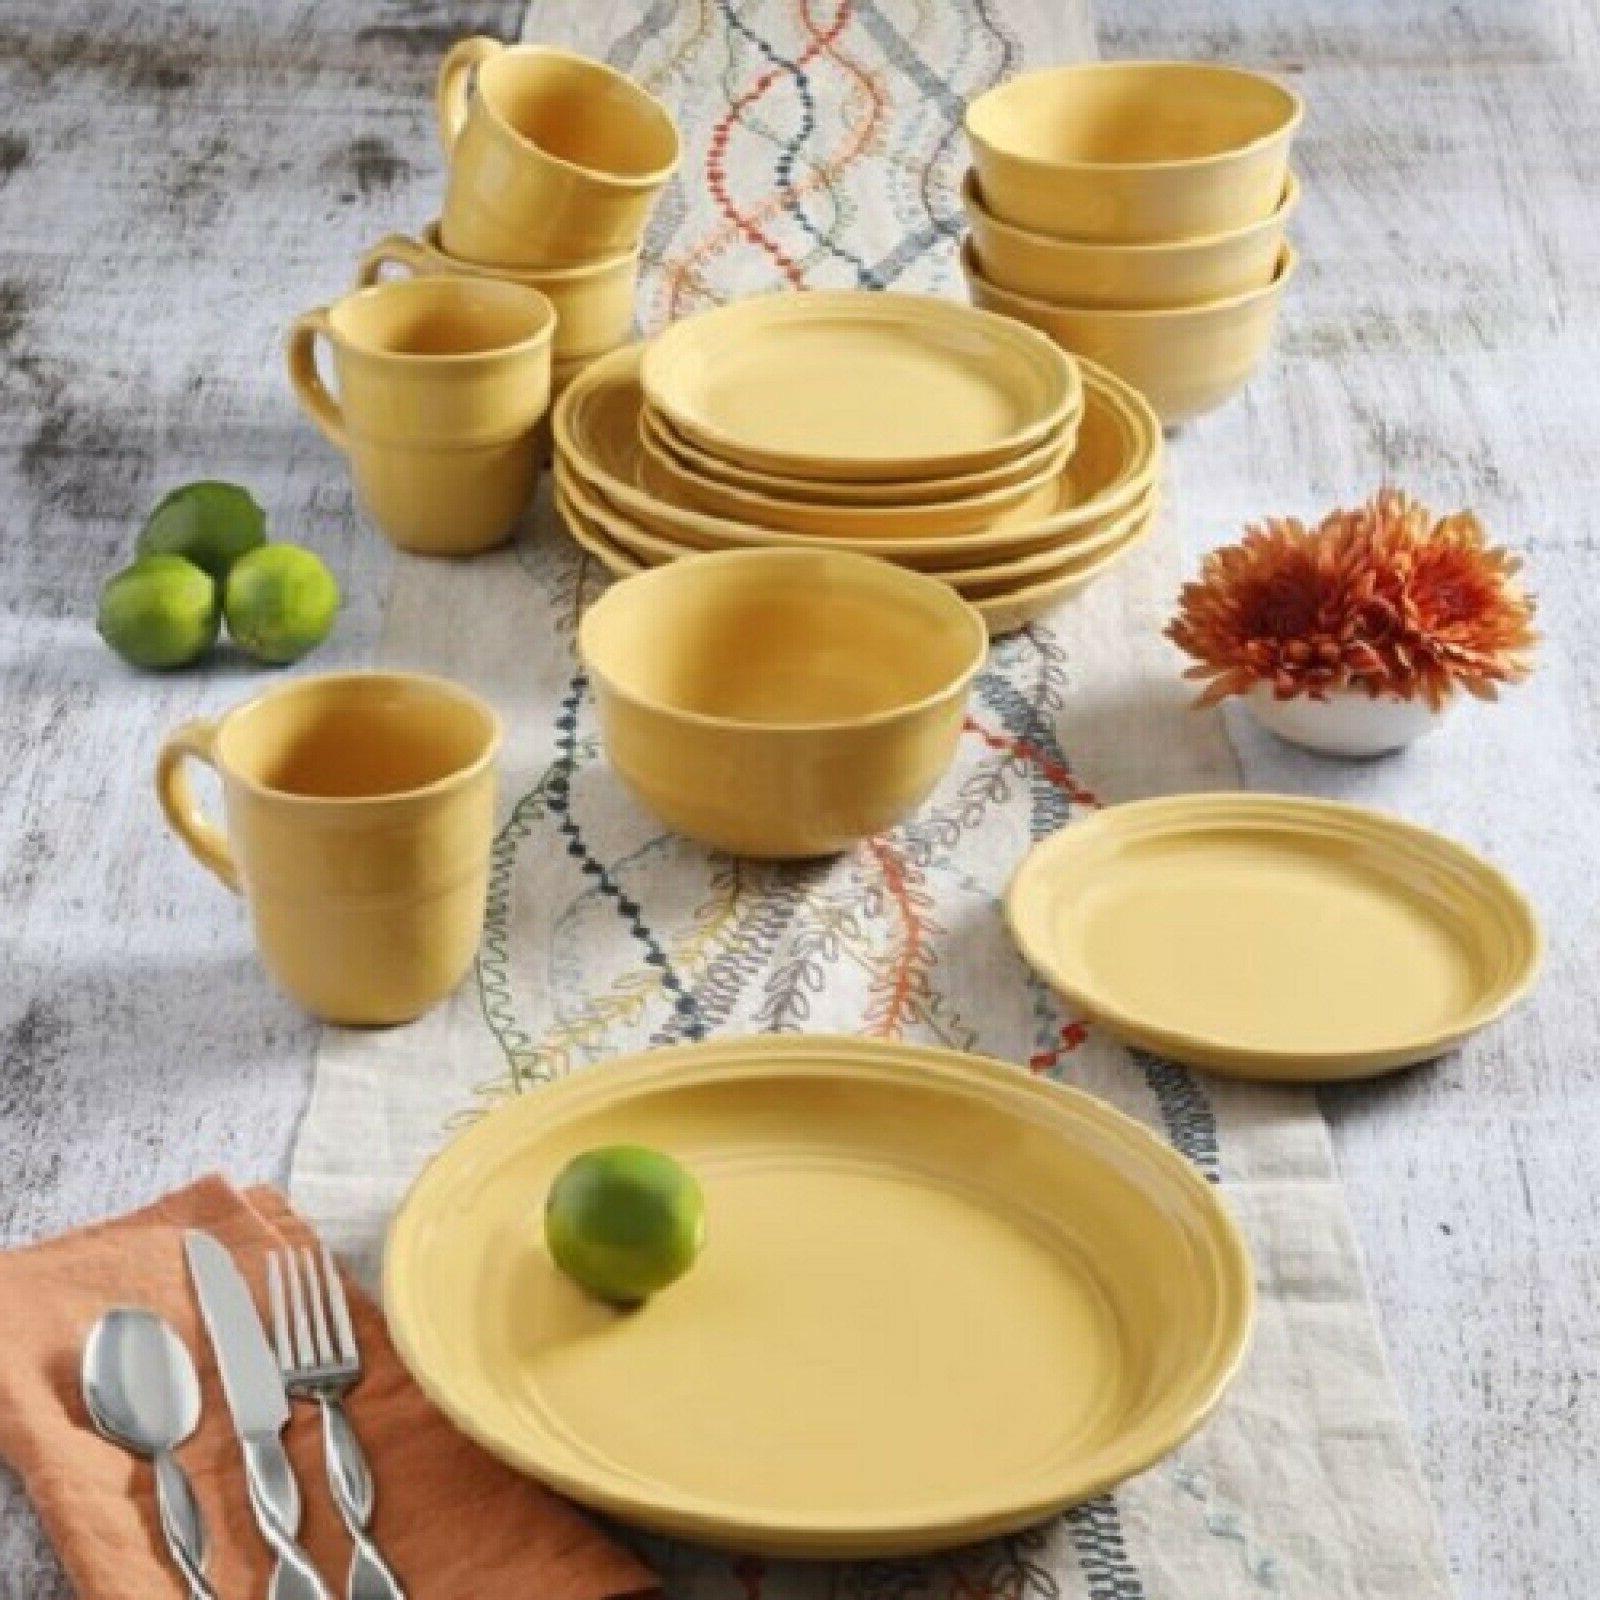 16 Piece Dinnerware Set Plates Bowls Mug Kitchen Dining Home